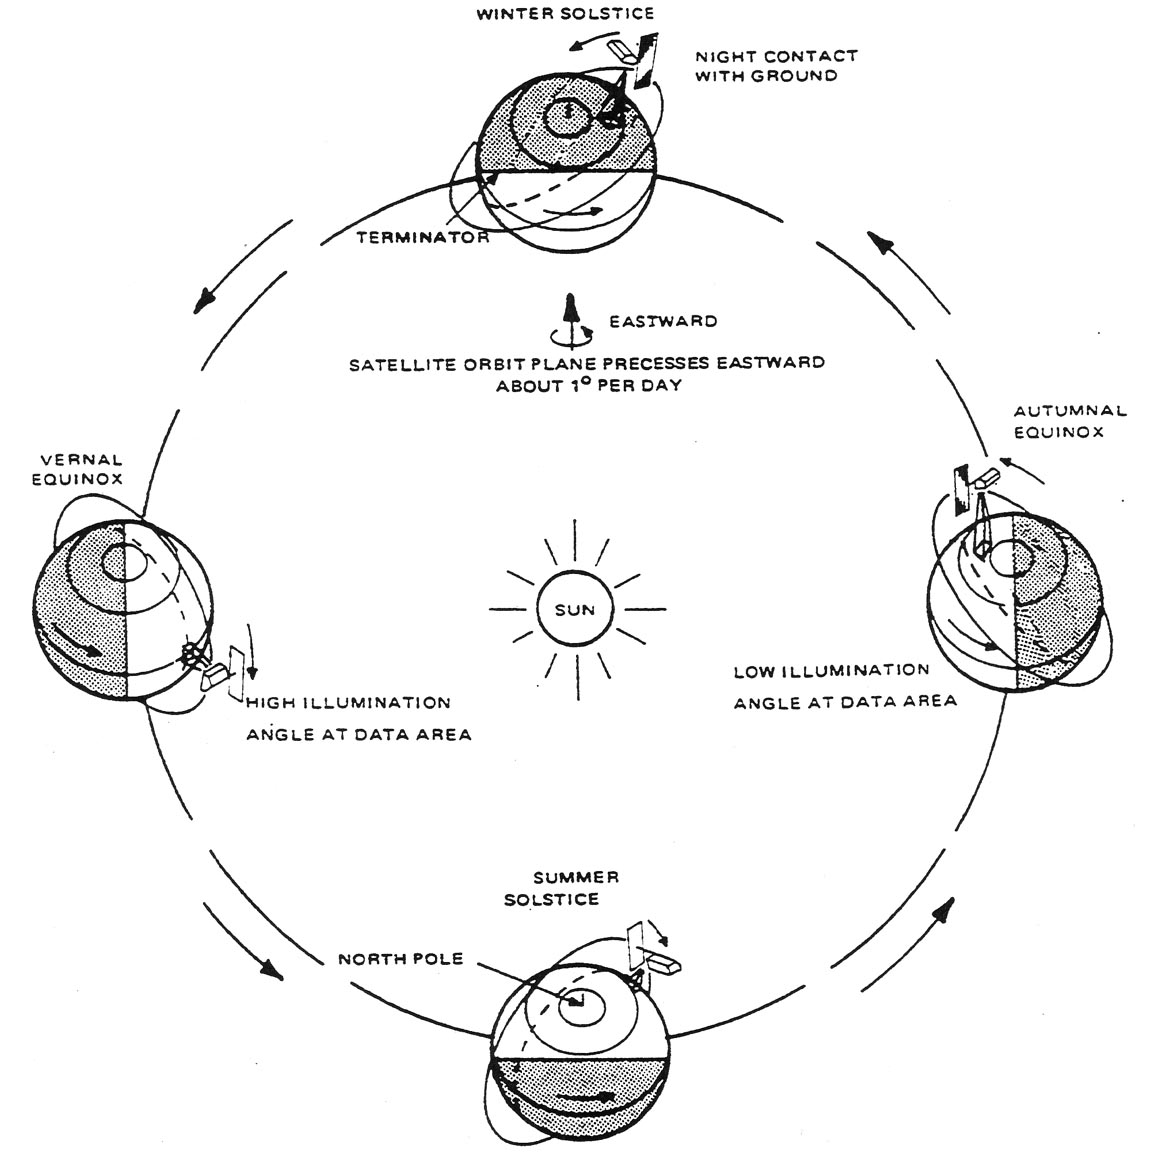 hight resolution of schematic diagram illustrating the seasonal illumination variations on a sun synchronous orbit